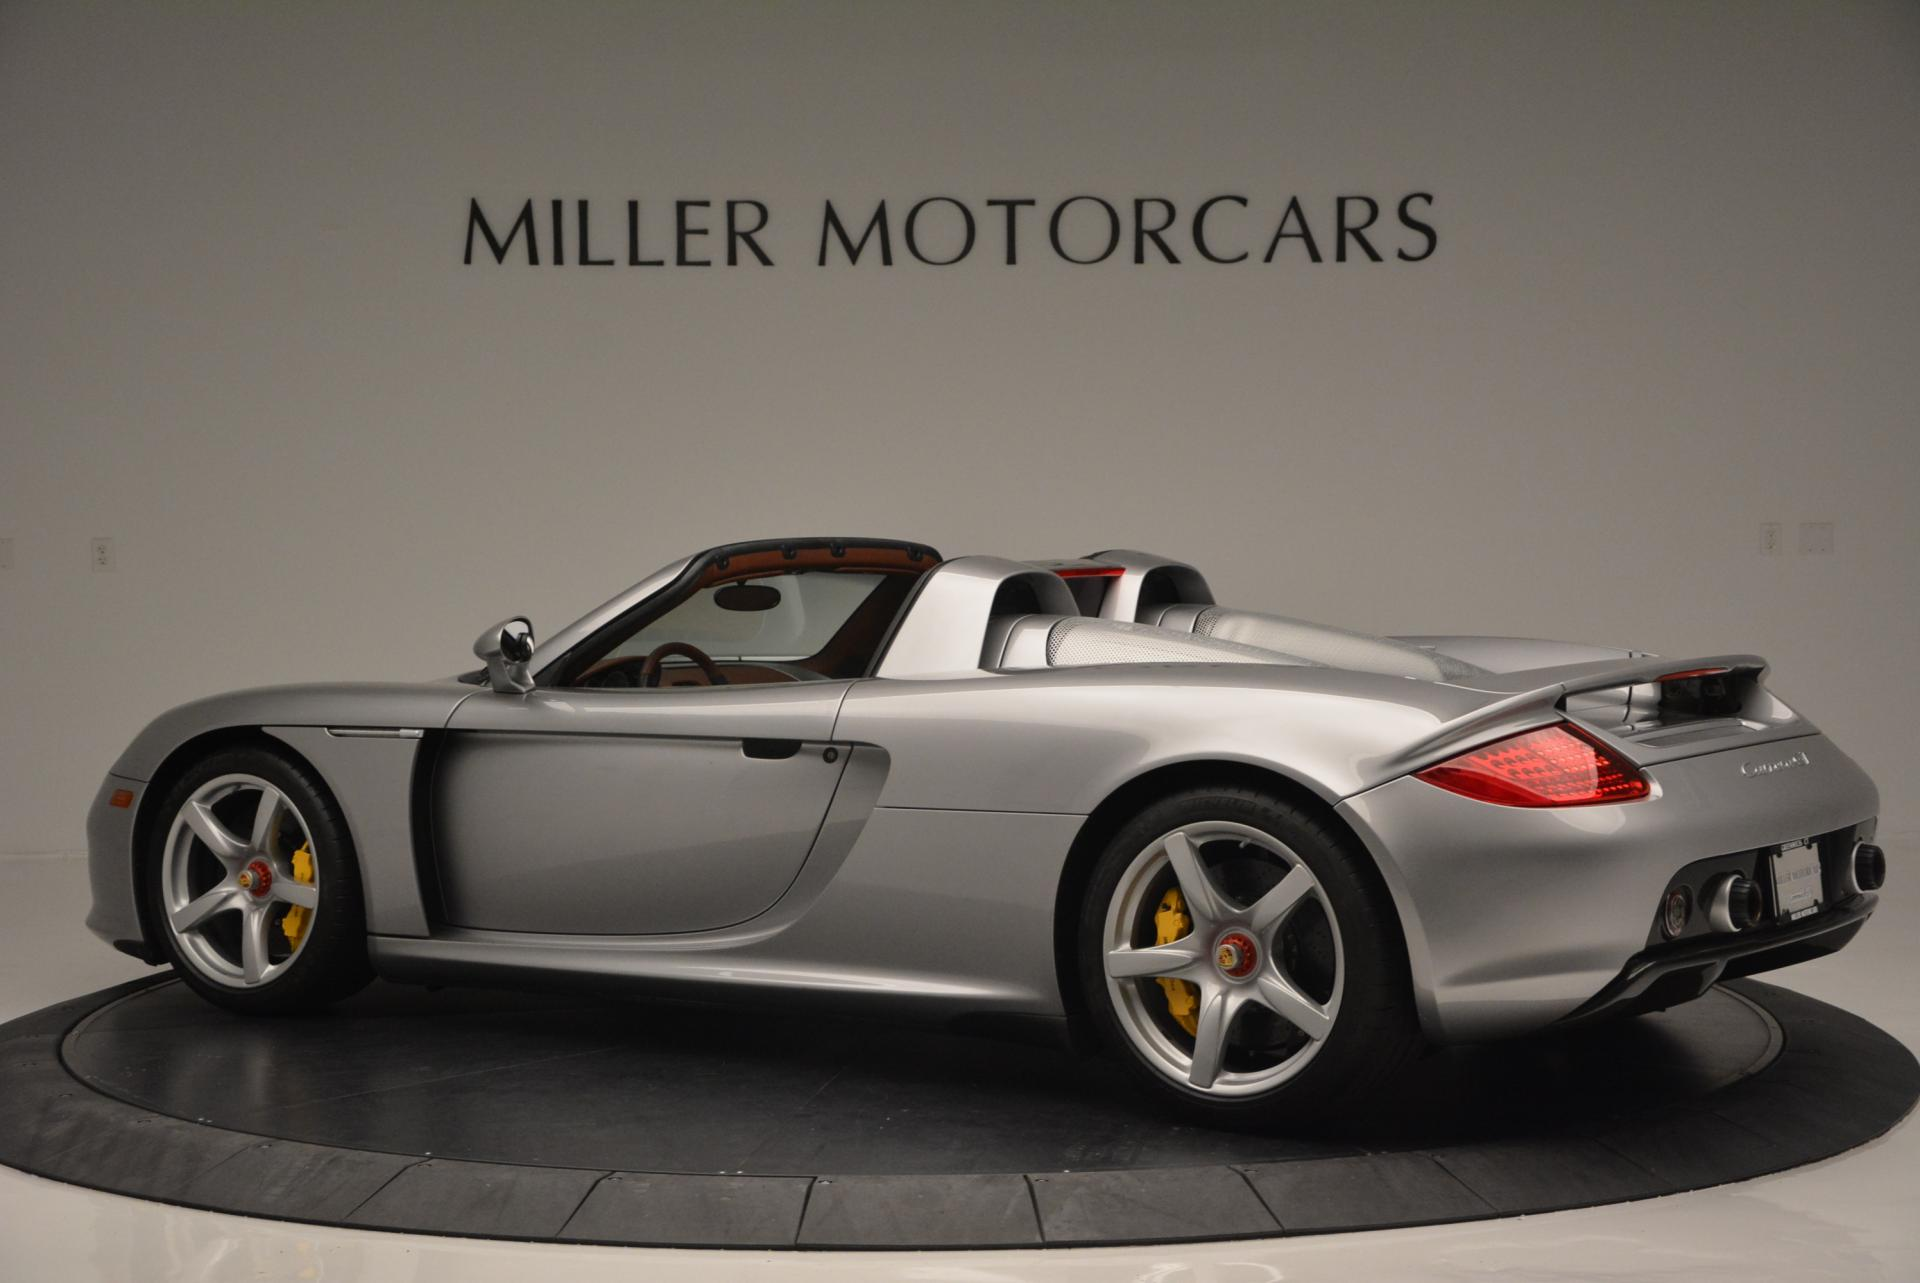 Used 2005 Porsche Carrera GT  For Sale In Greenwich, CT 108_p5